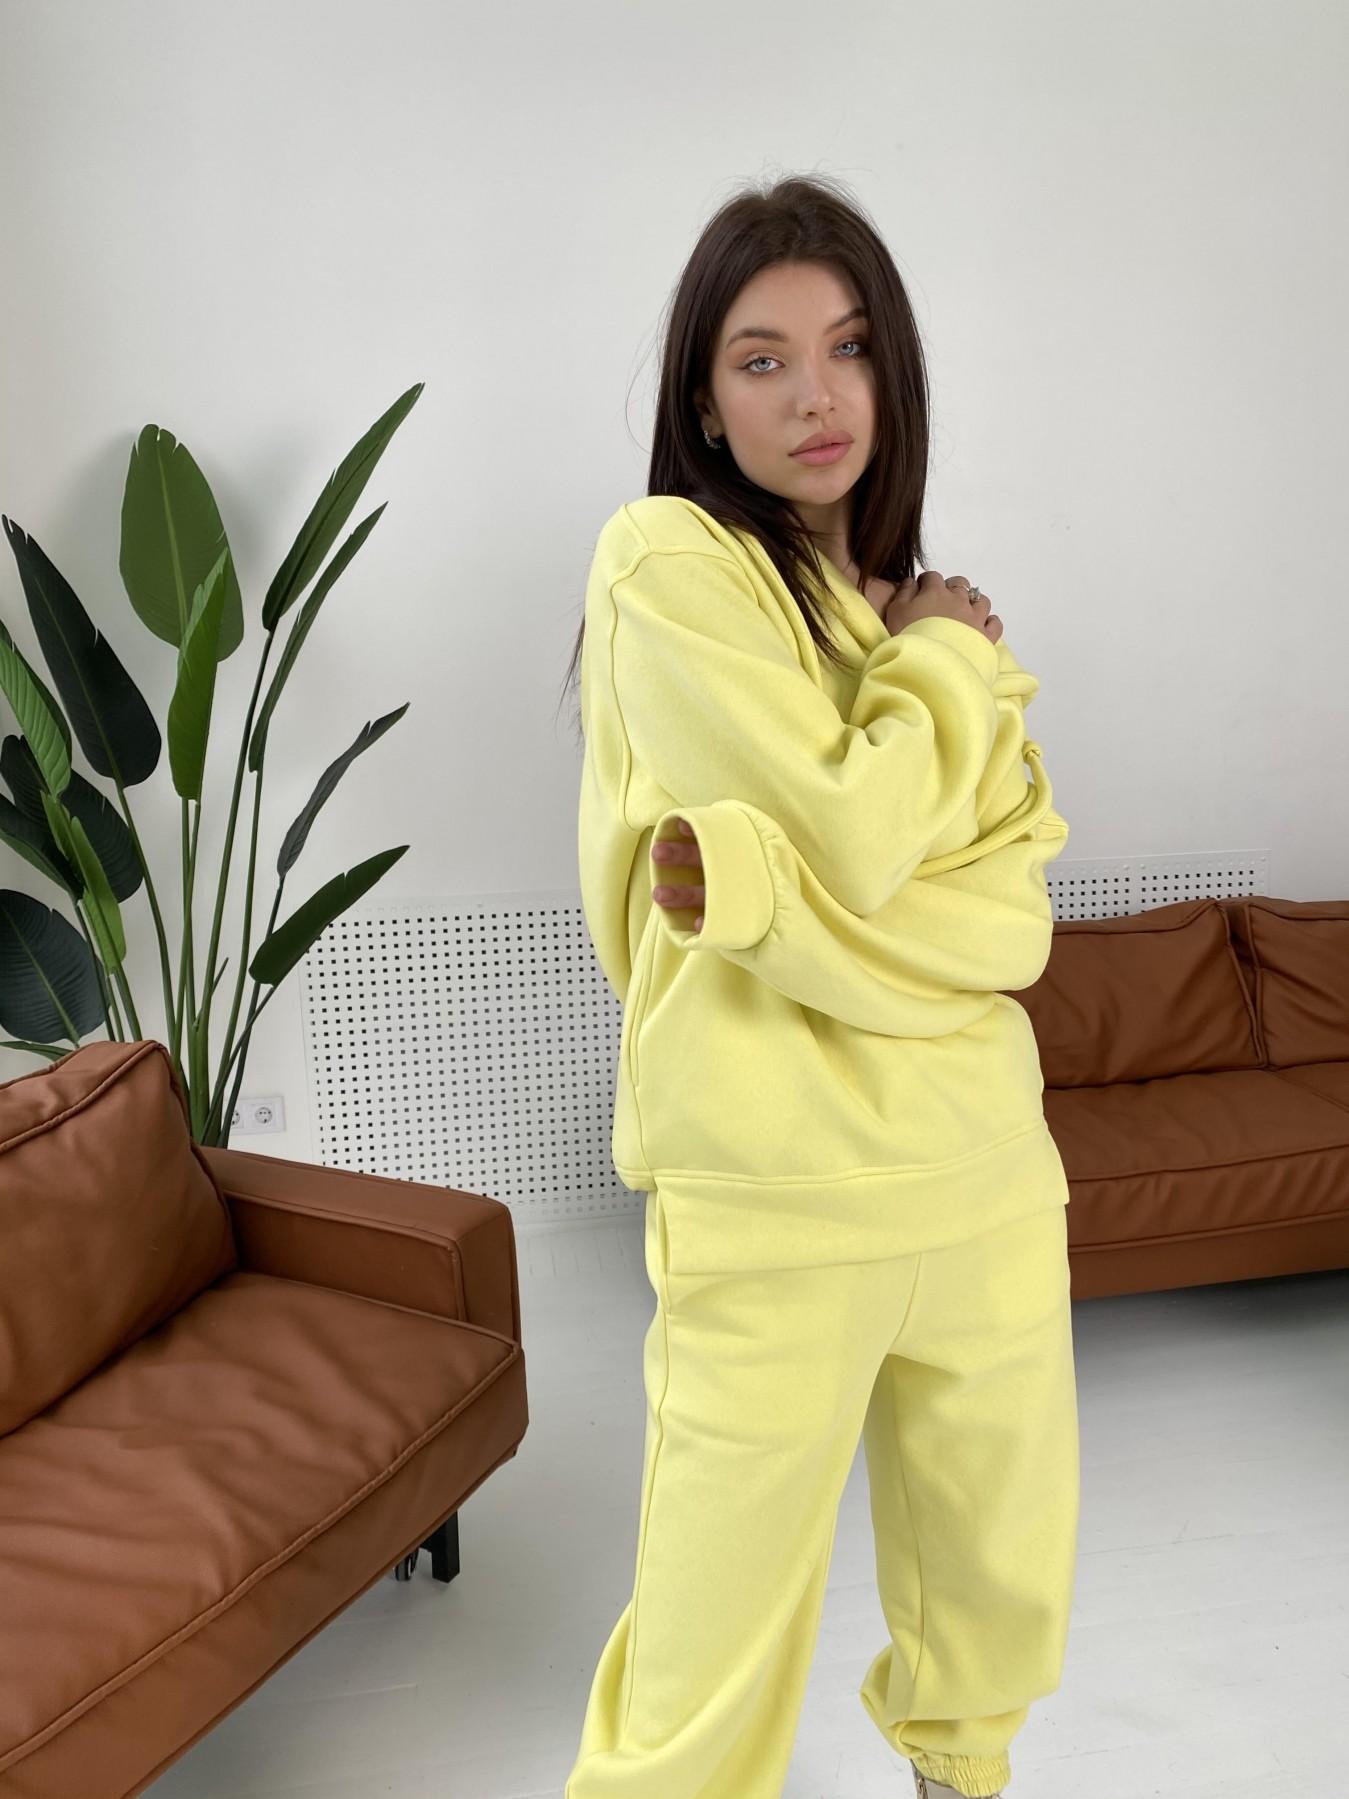 Ярис костюм из 3х нитки 10789 АРТ. 47259 Цвет: Лимон - фото 3, интернет магазин tm-modus.ru